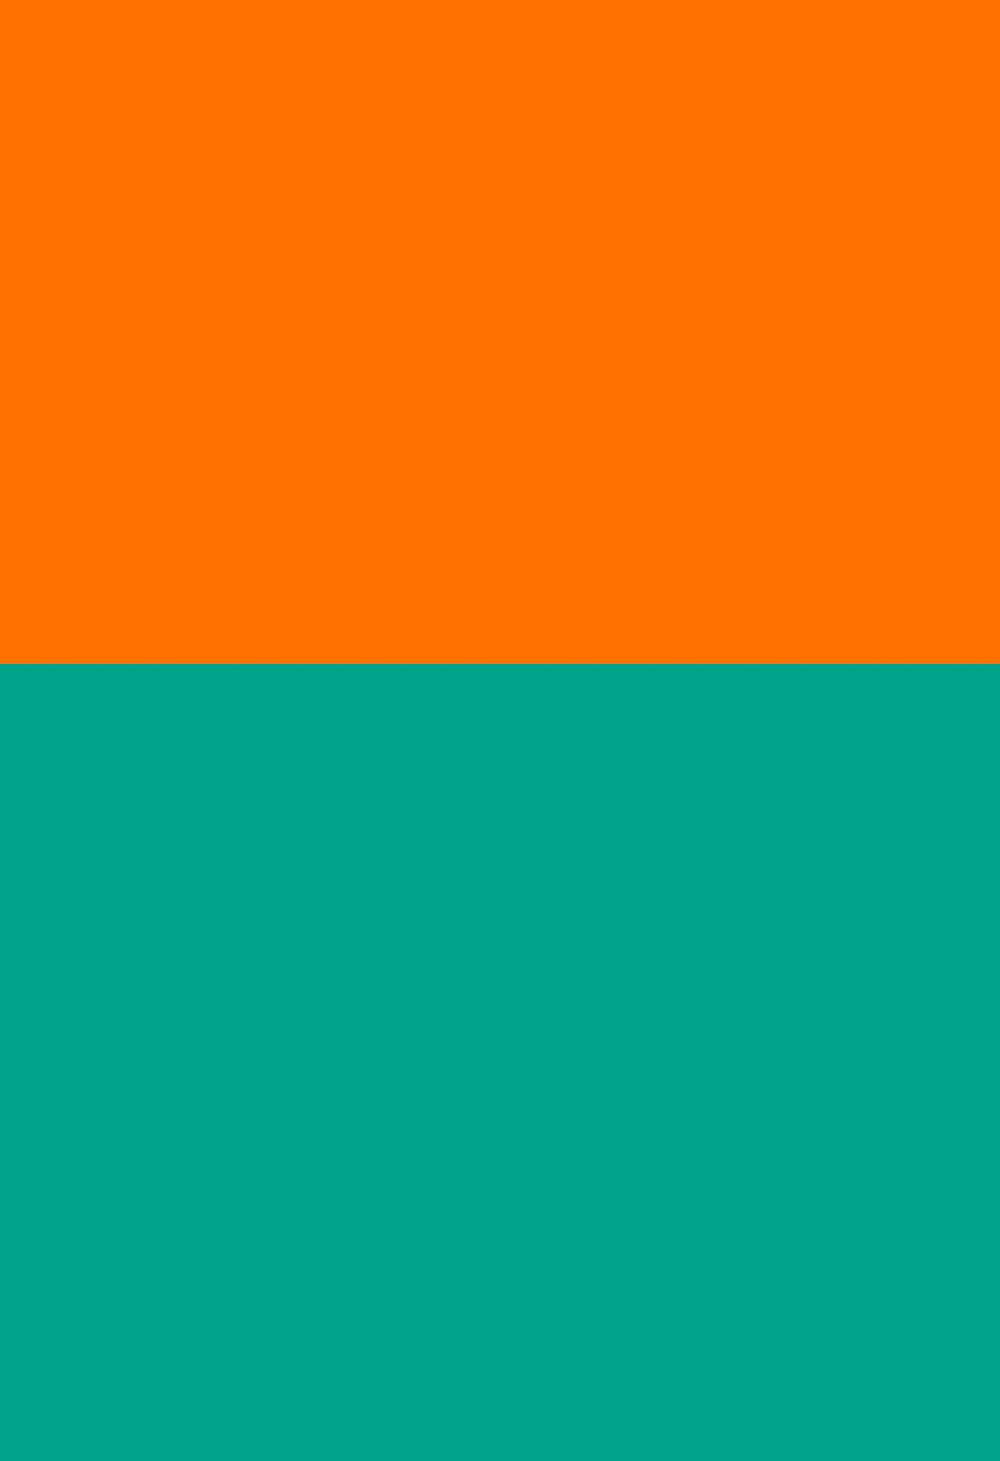 square-6.jpg